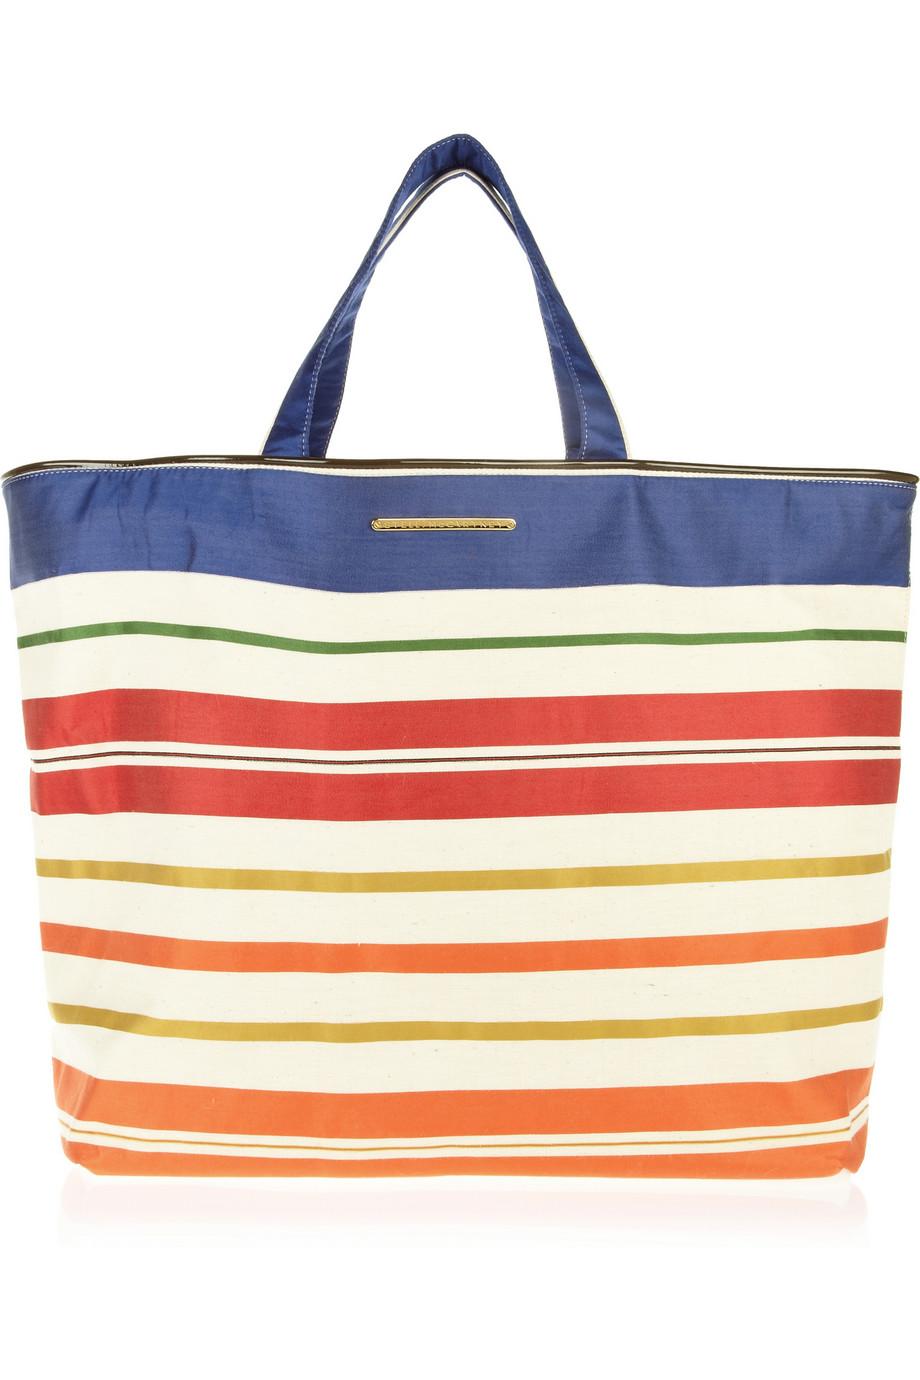 Stella Mccartney Vanessa Striped Cotton Beach Bag in Blue - Lyst f75dde26550f2